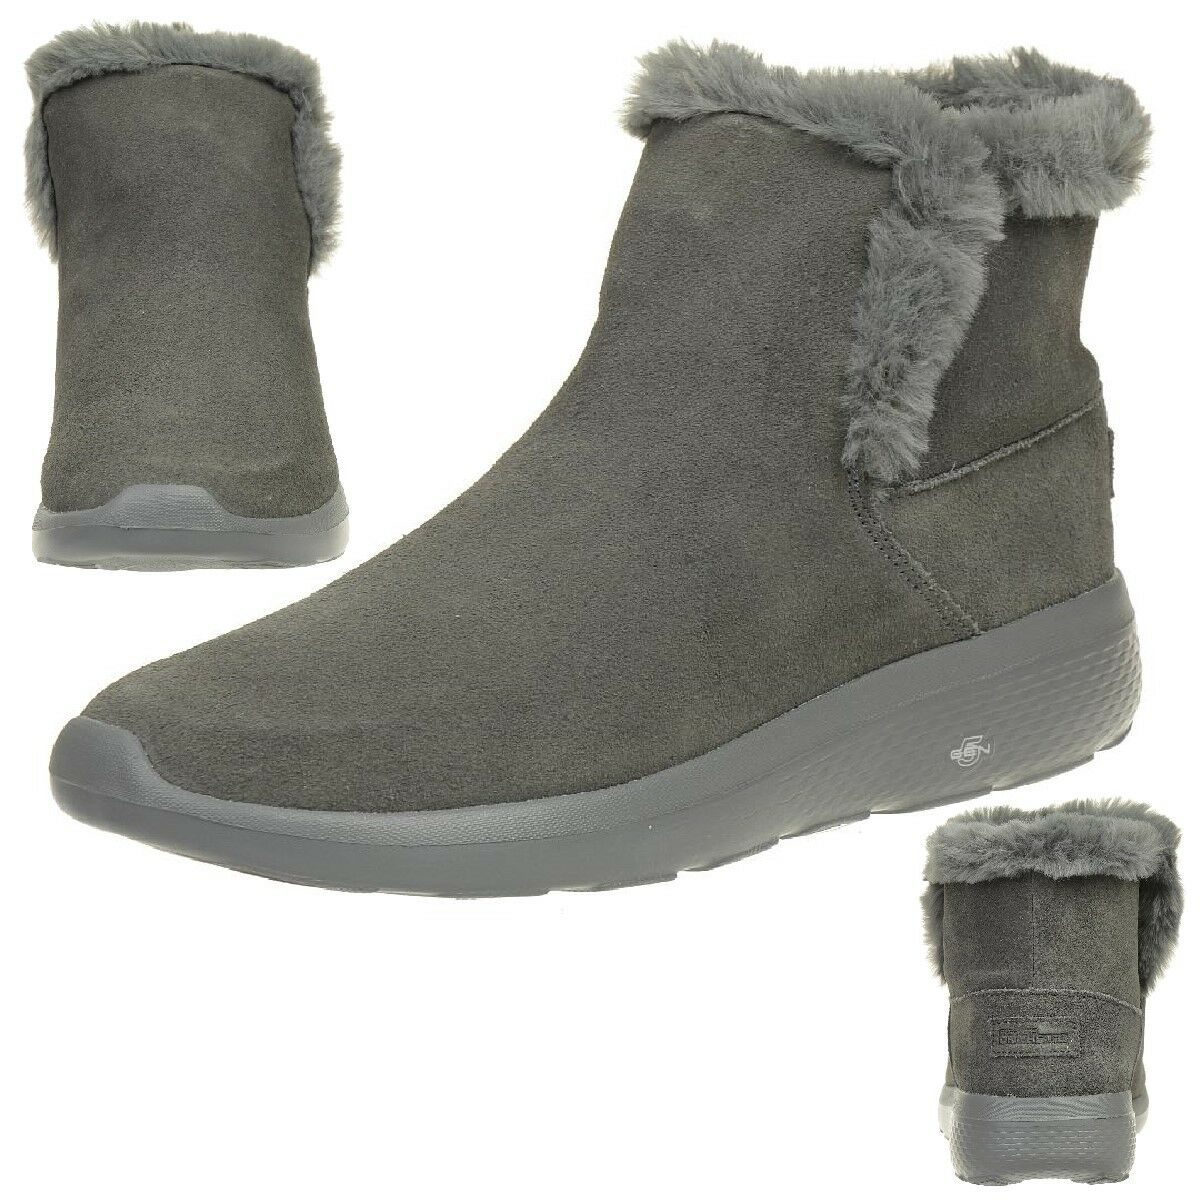 Zapatos promocionales para hombres y mujeres Skechers On the Go 400 City 2 Bundle Stiefel Damen Winterschuhe gefüttert CHAR